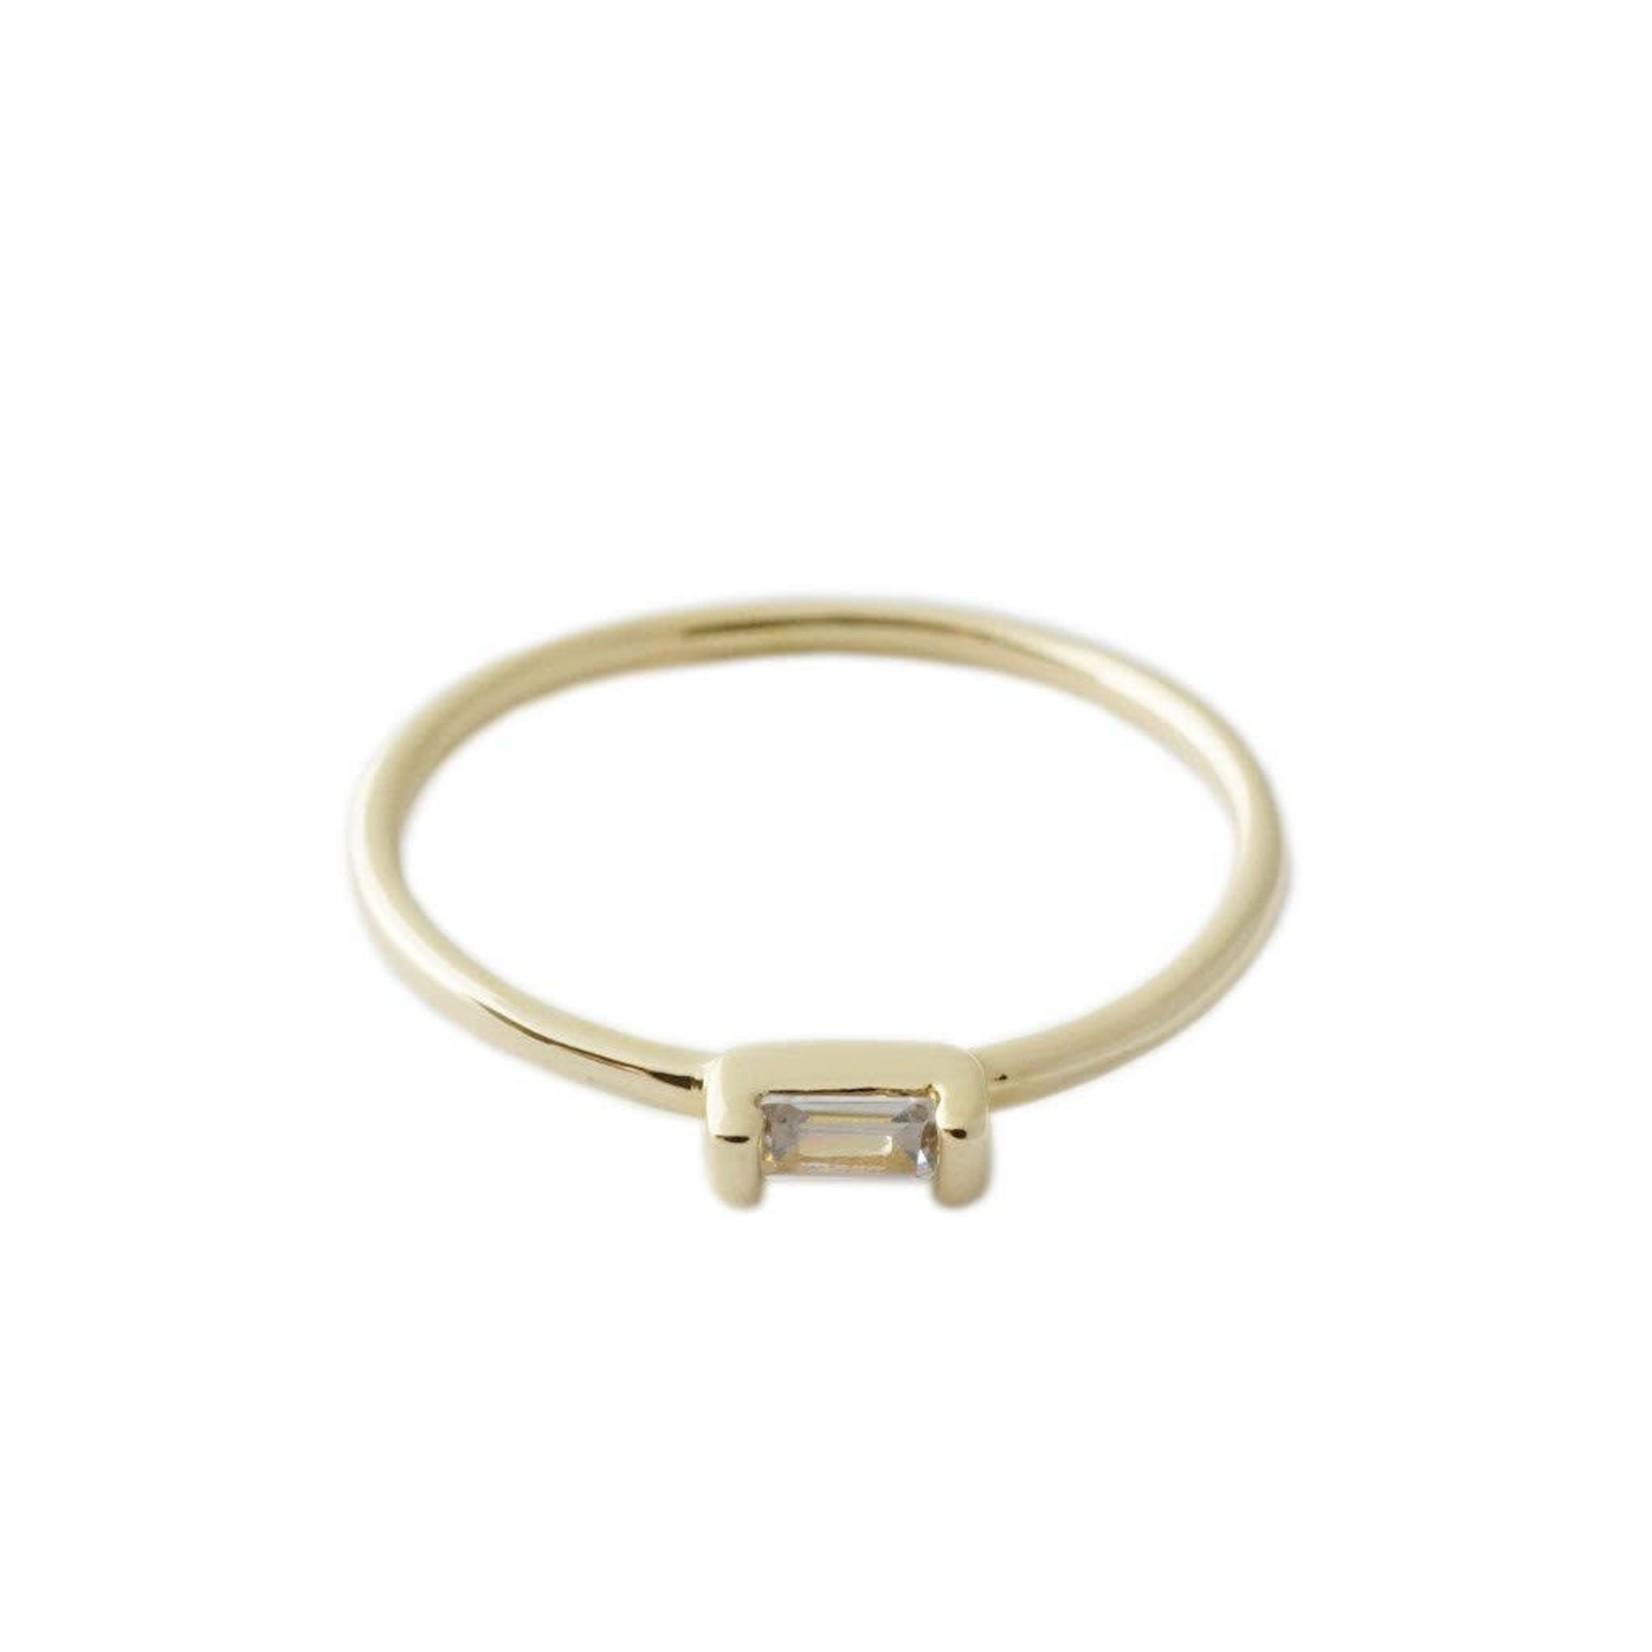 Honeycat Jewelry Honeycat Crystal Baguette Ring Gold